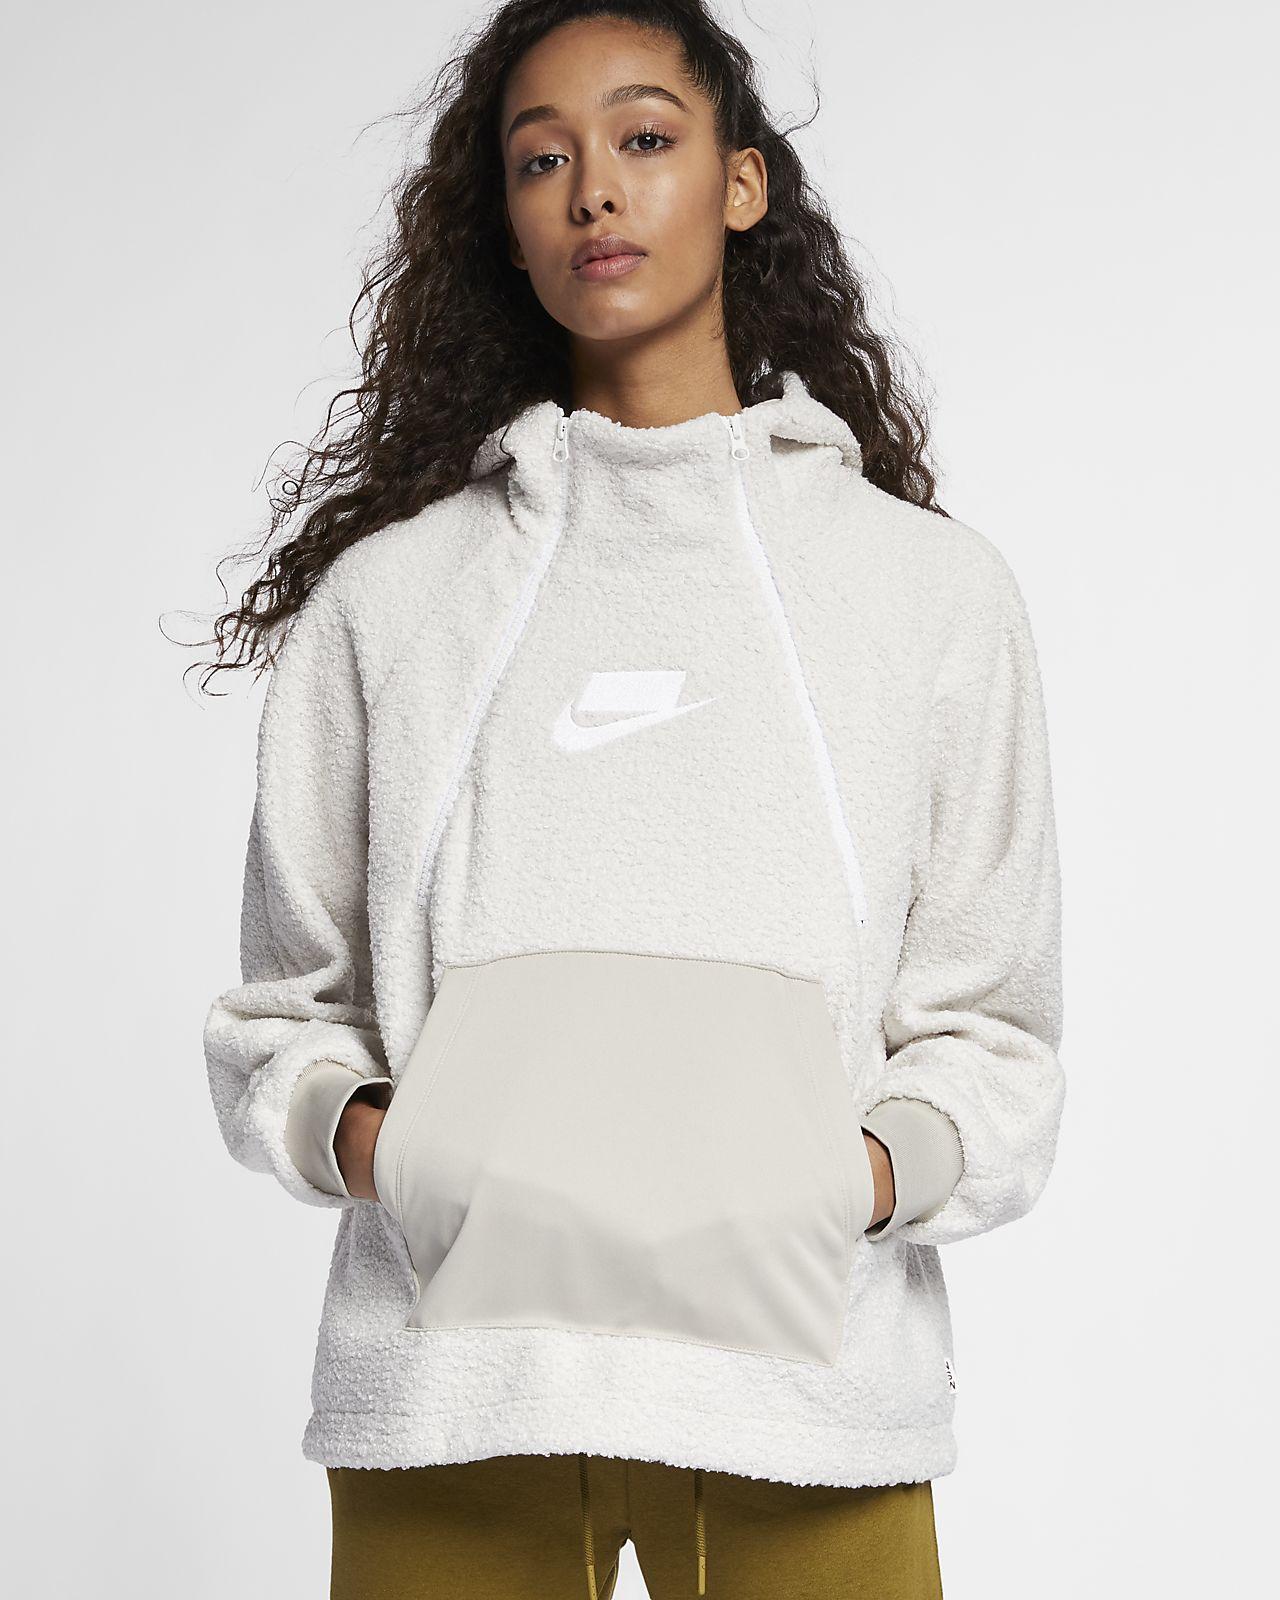 Sudadera con capucha sin cierre de tejido Sherpa para mujer Nike Sportswear NSW